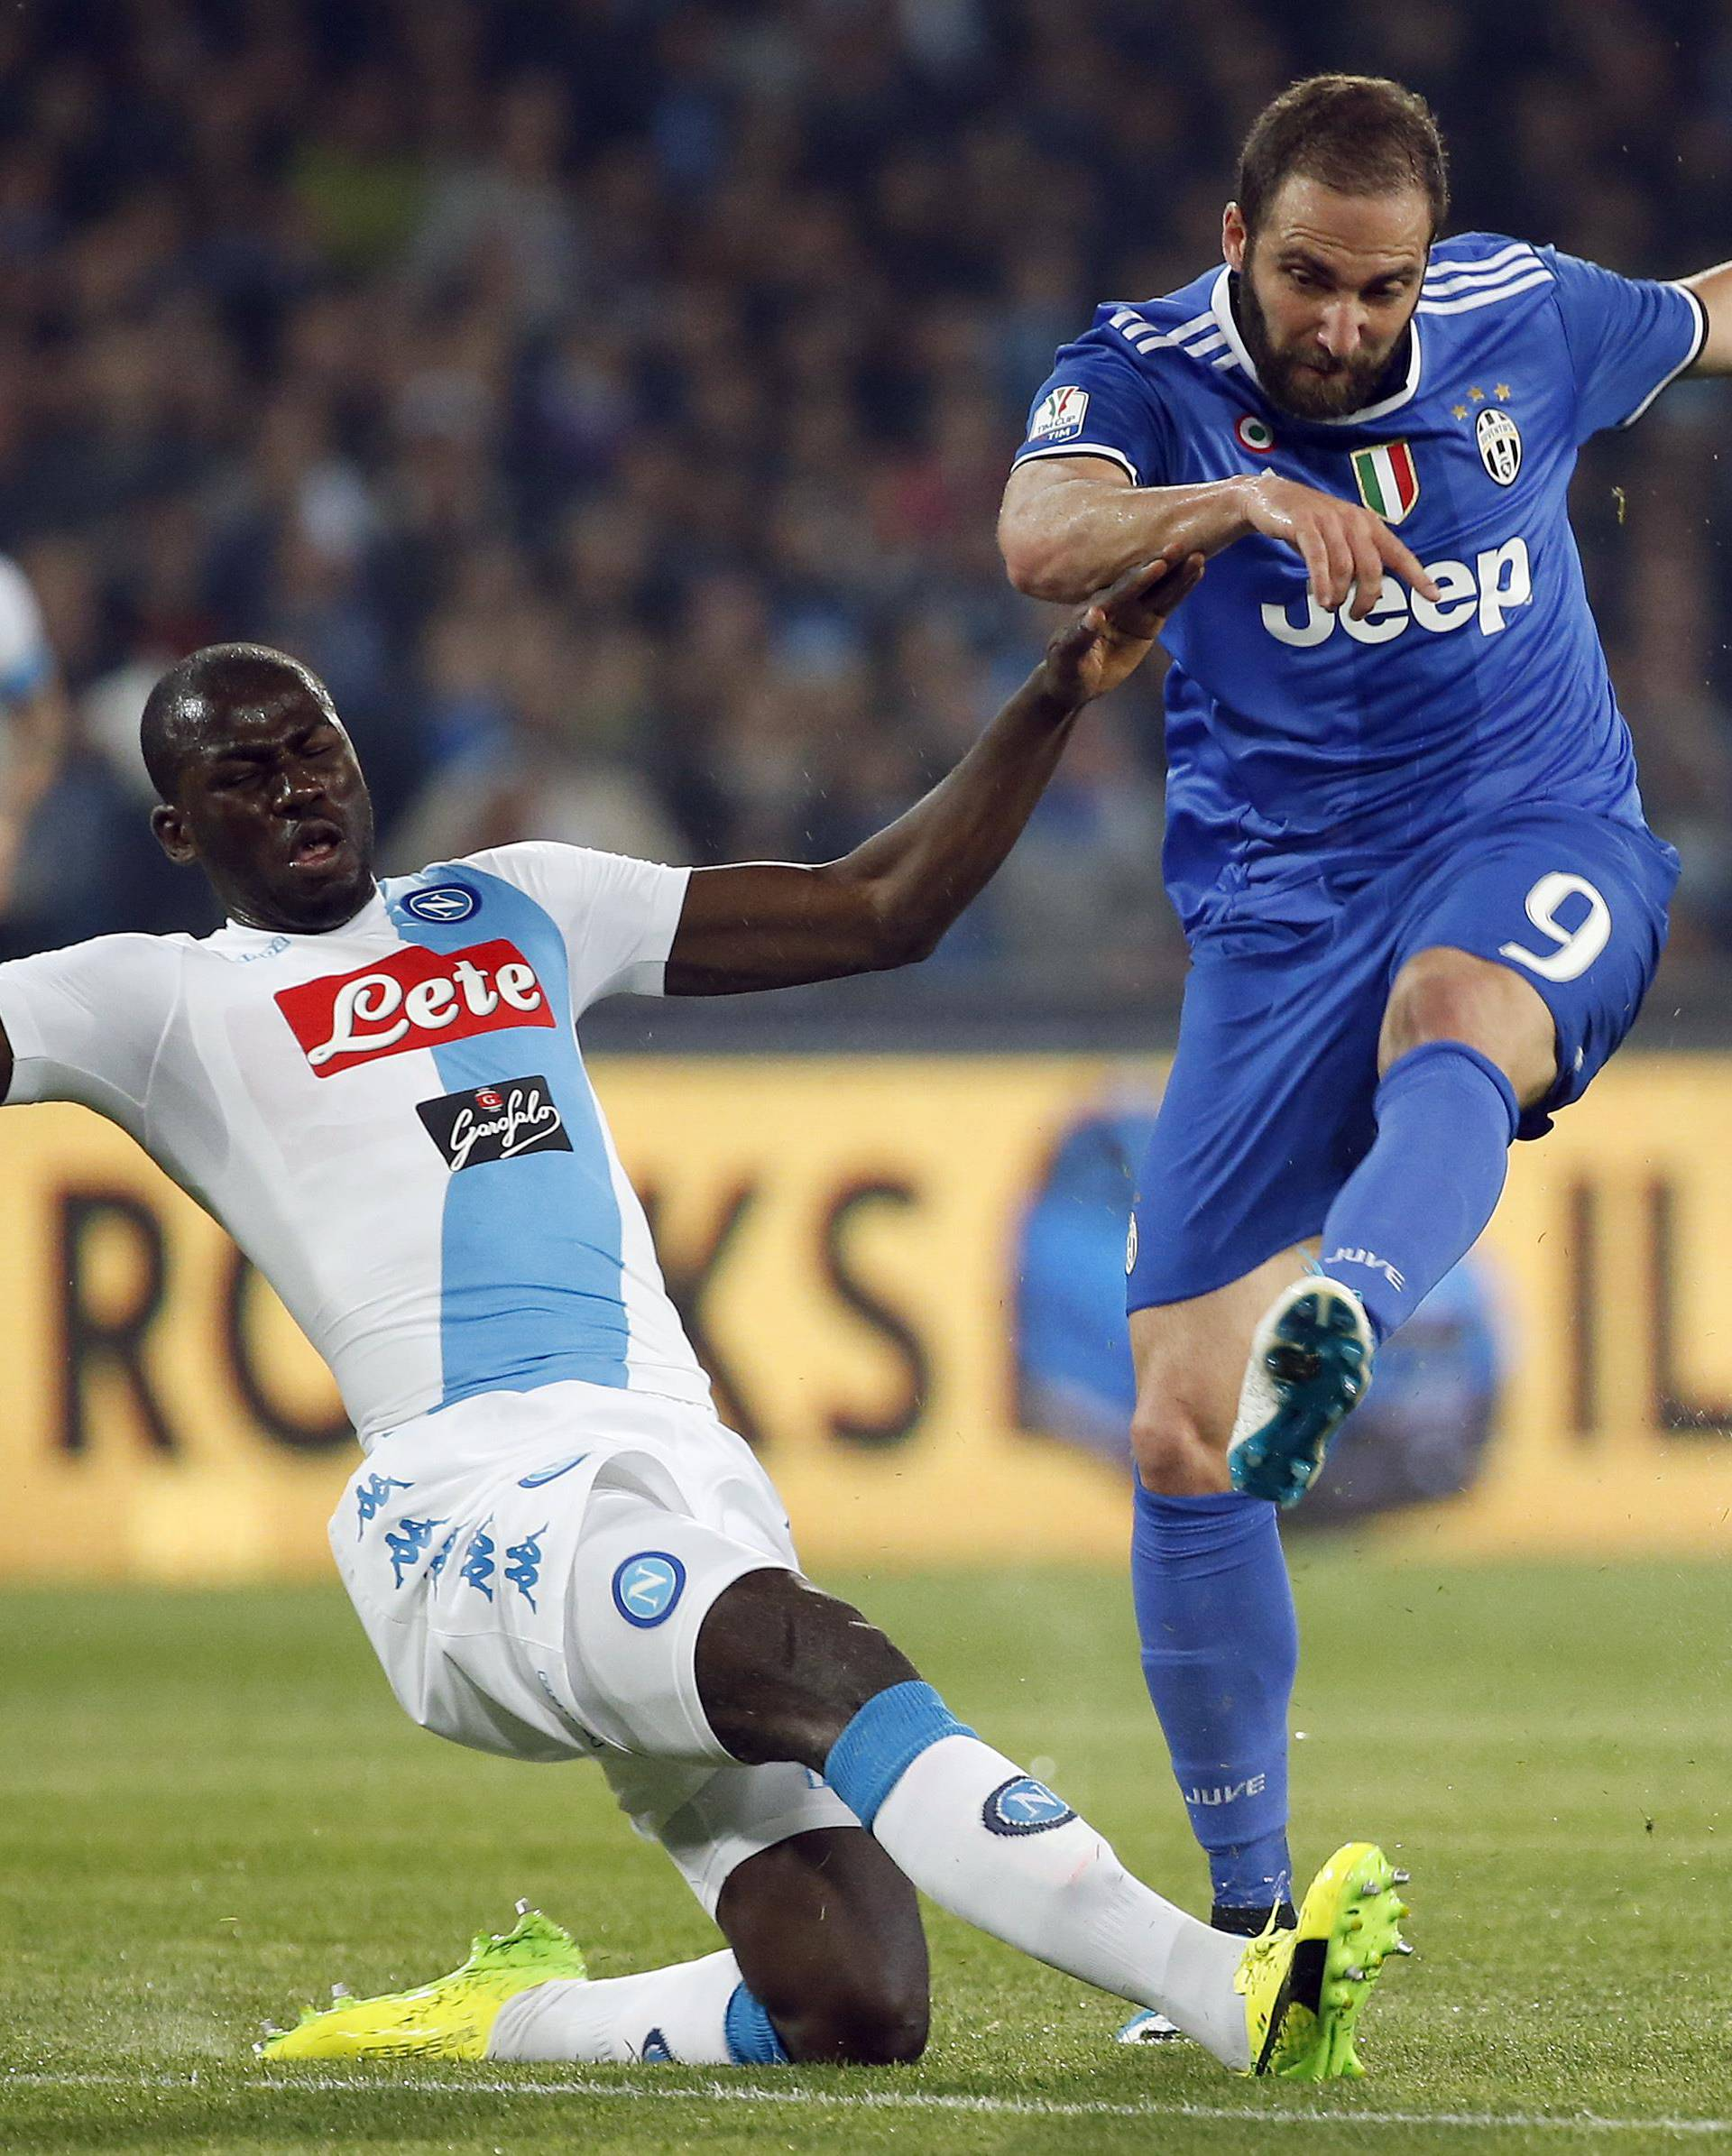 Football Soccer - Napoli v Juventus - Italian Cup